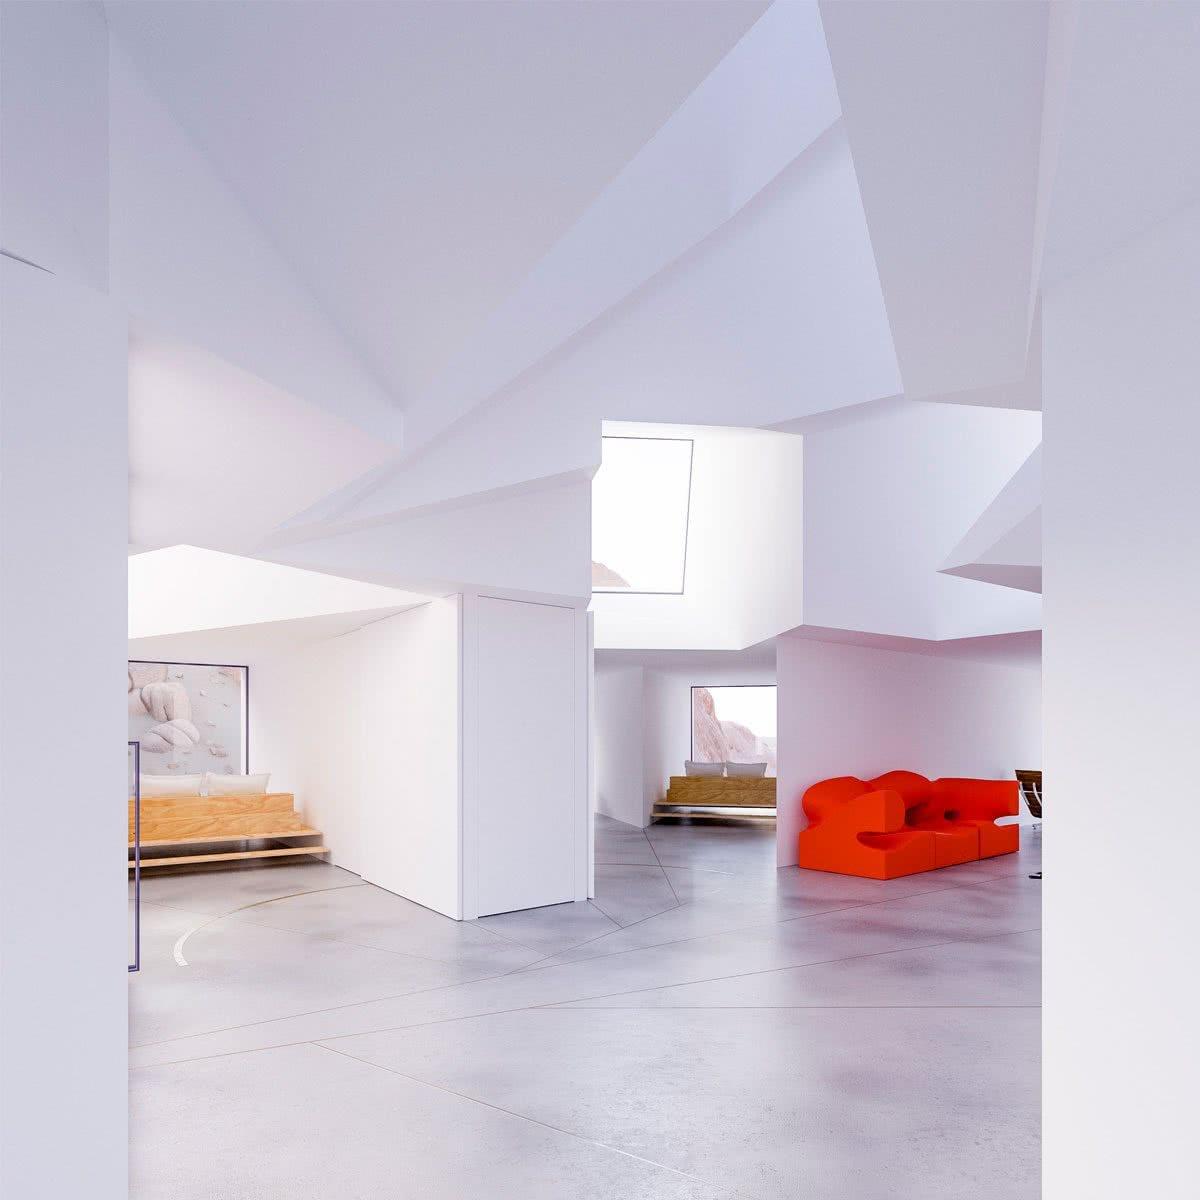 Whitaker+Studio_Joshua+Tree+Residence_05_Entering+the+house_web_1200x1200